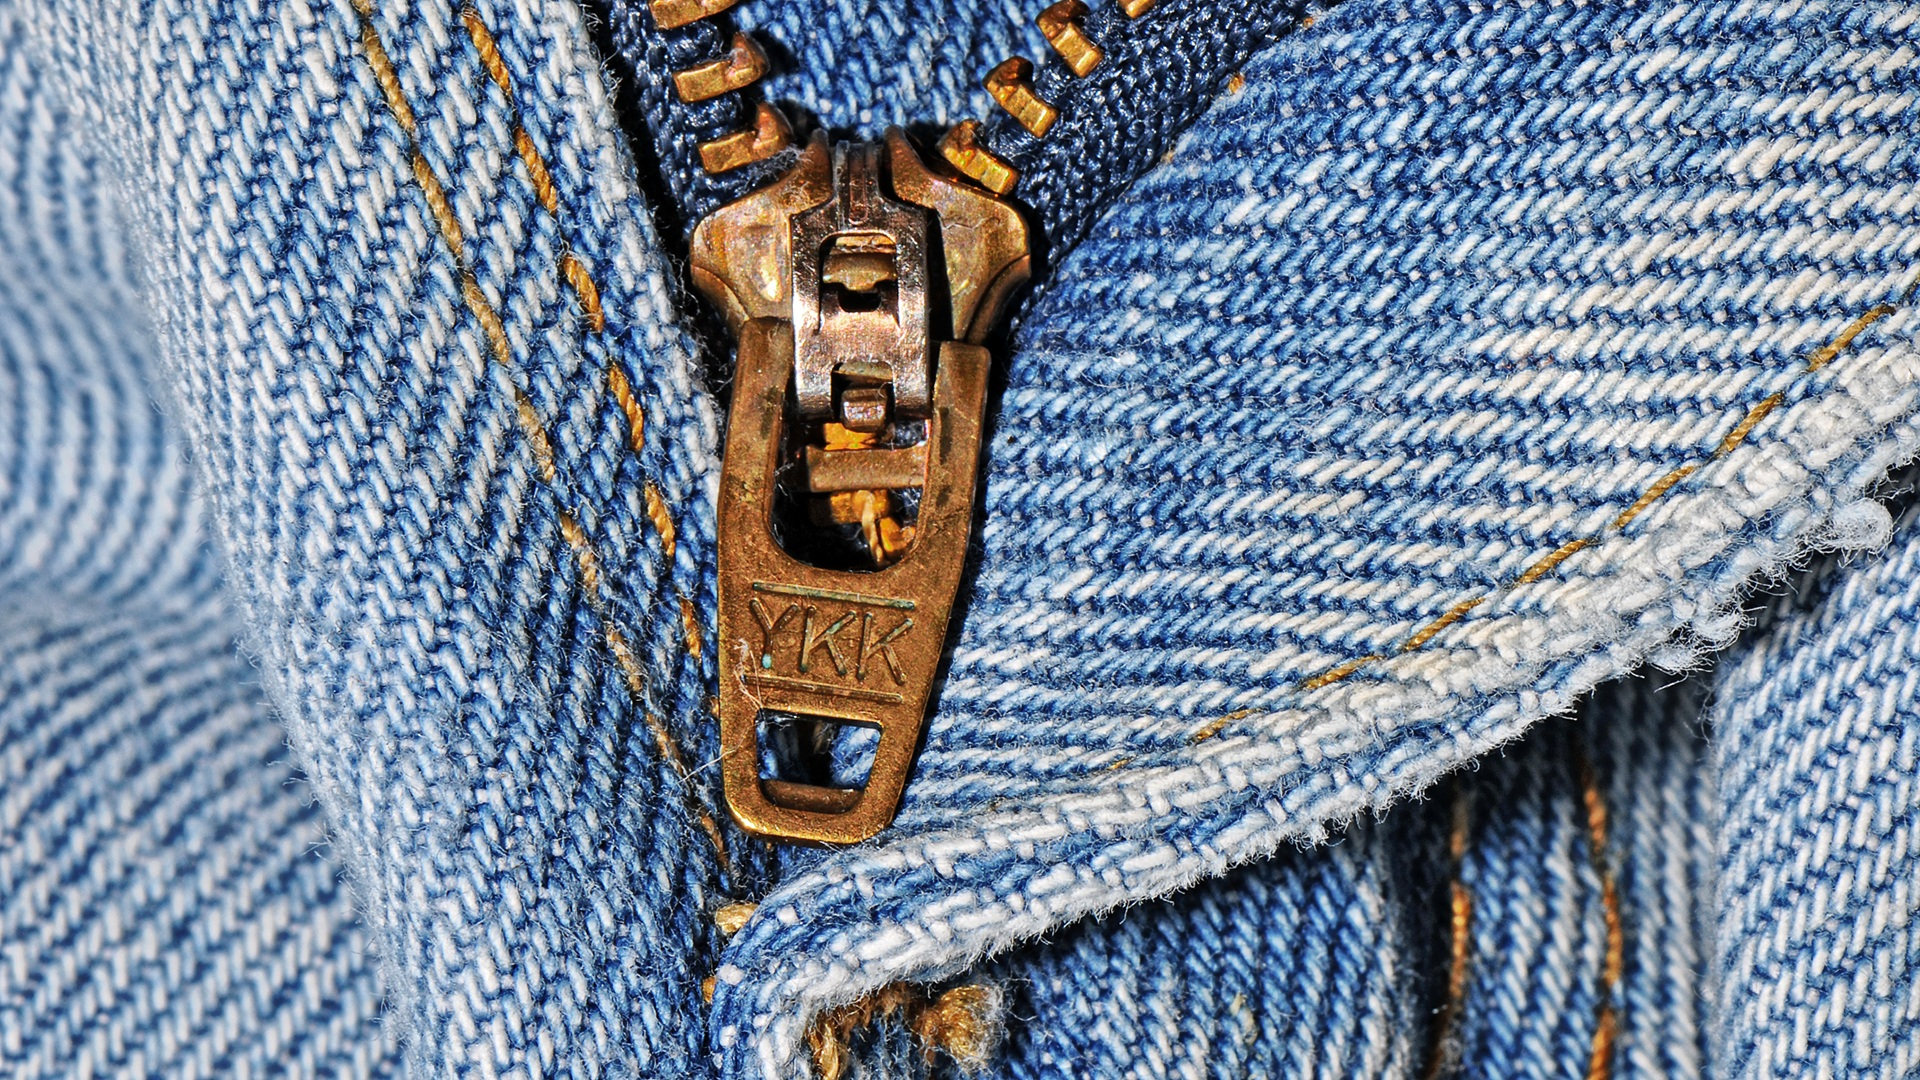 Jeans unzipping